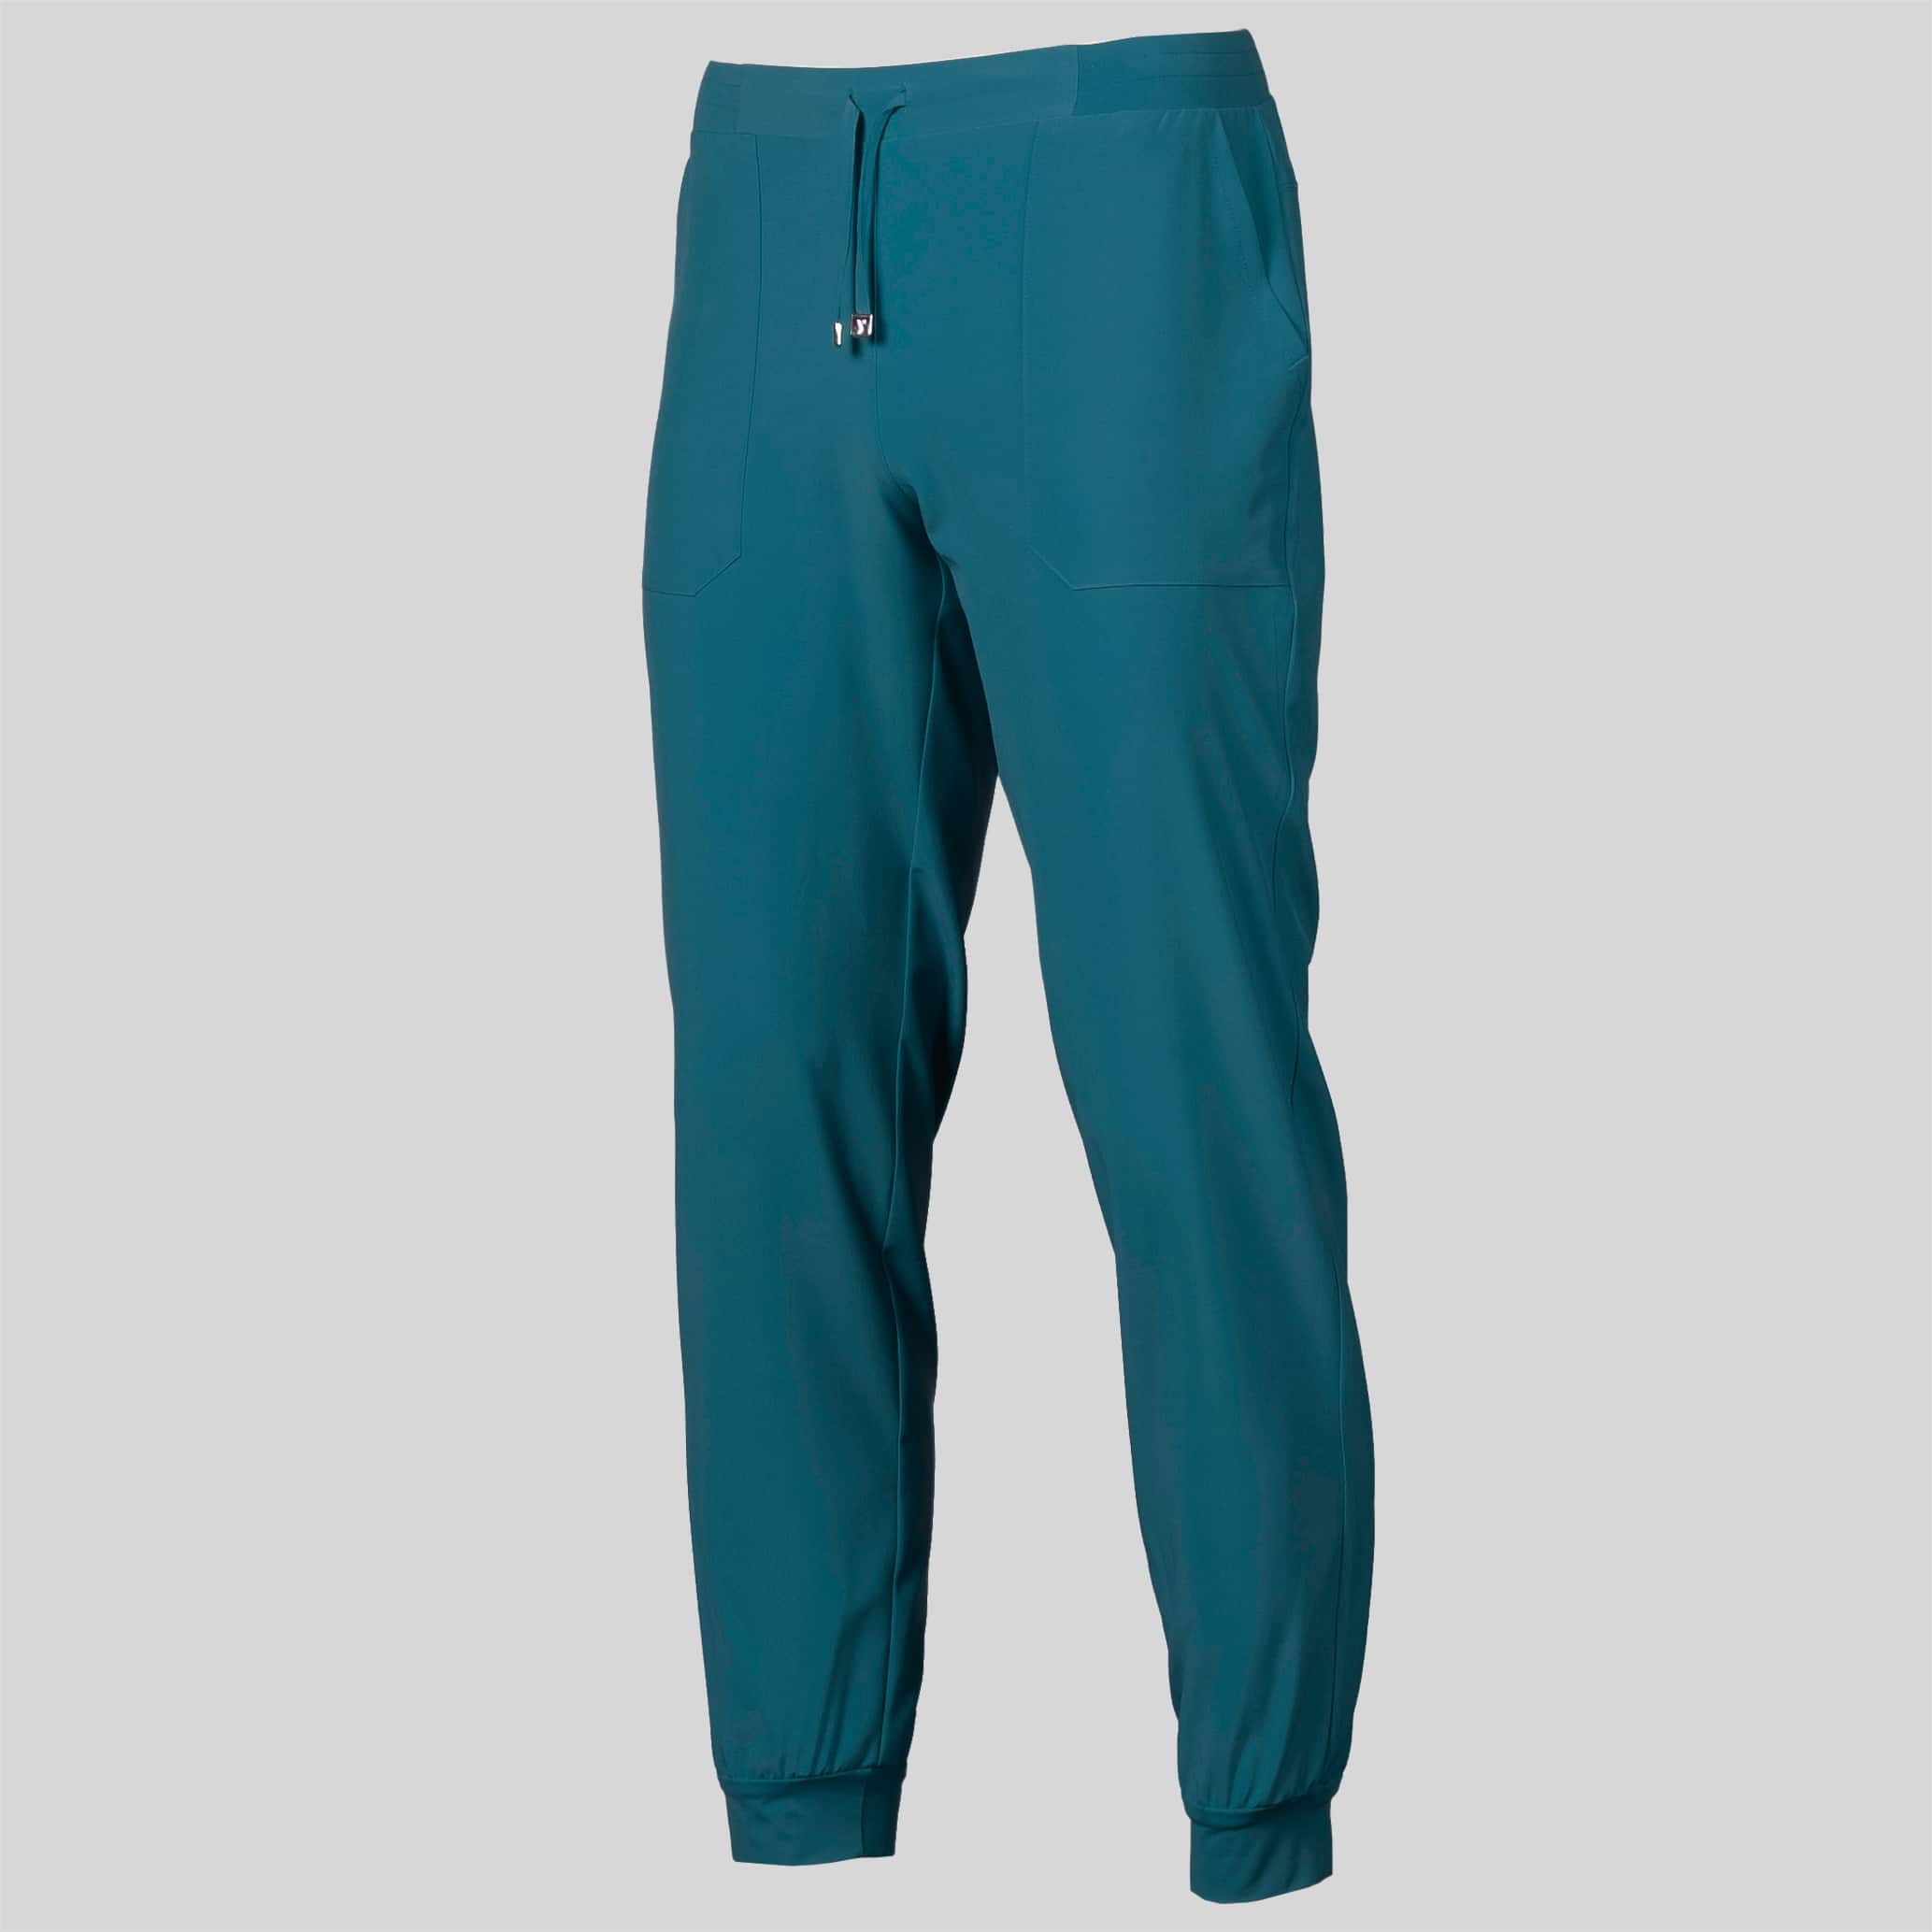 Gary´s 704700 Pantalon Unisex Jogger Verde PetrÓleo